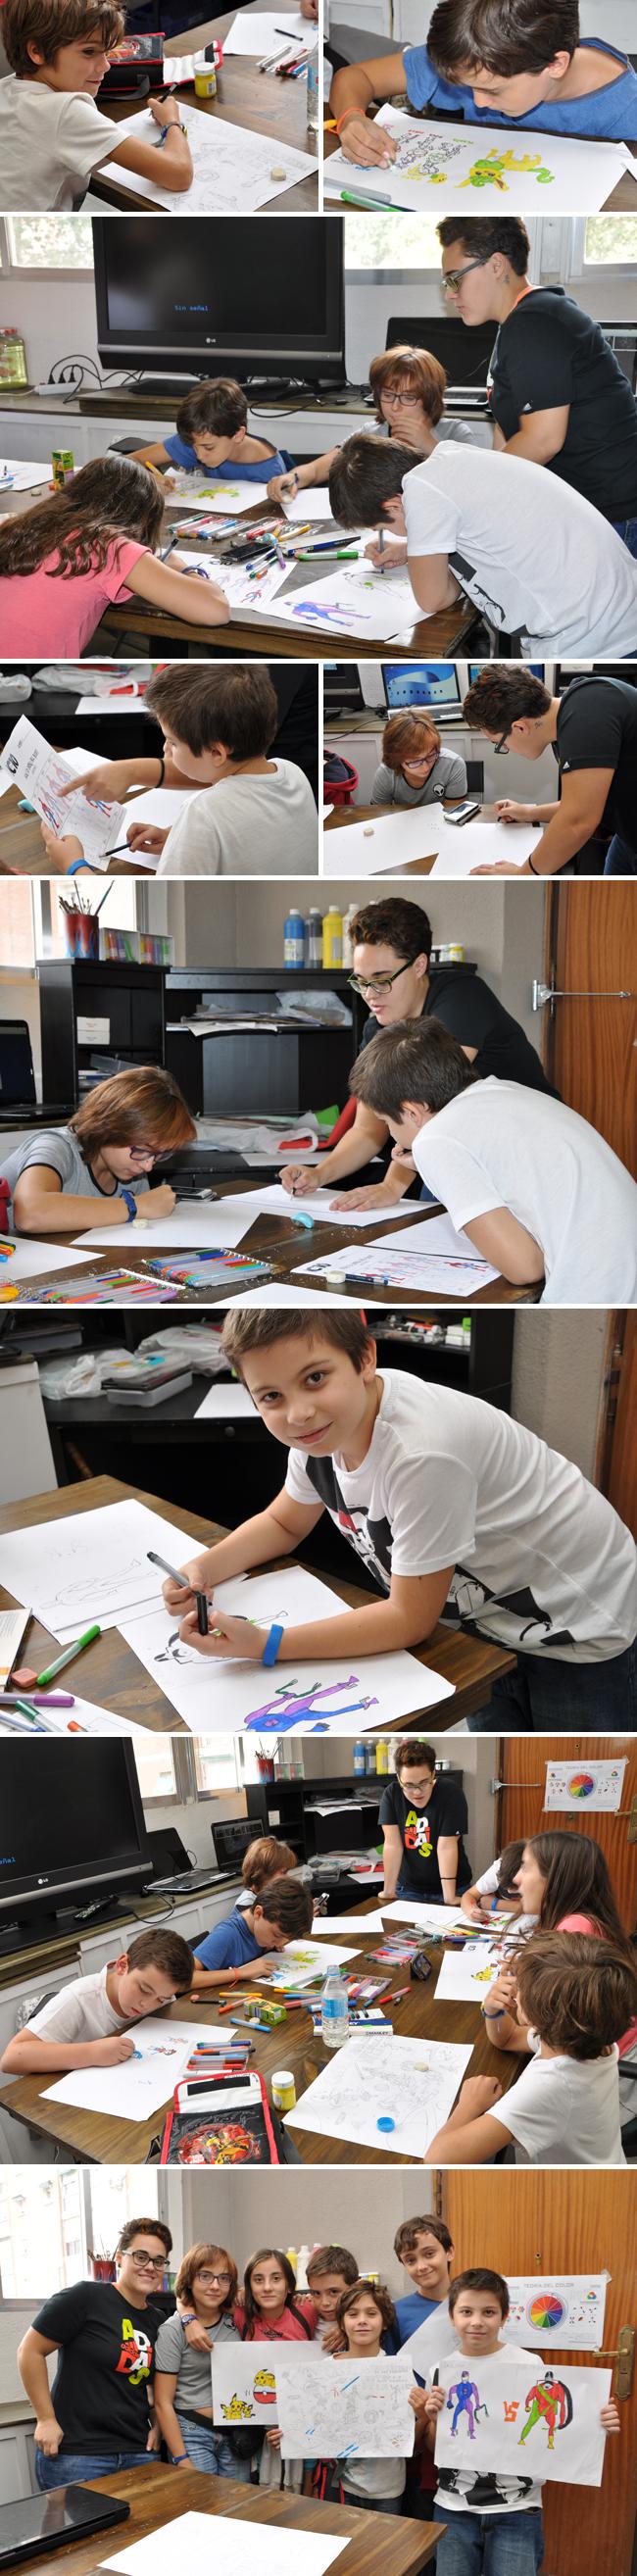 curso-dibujo-comic-digital-ninos-sabados-mananas-academiac10-madrid